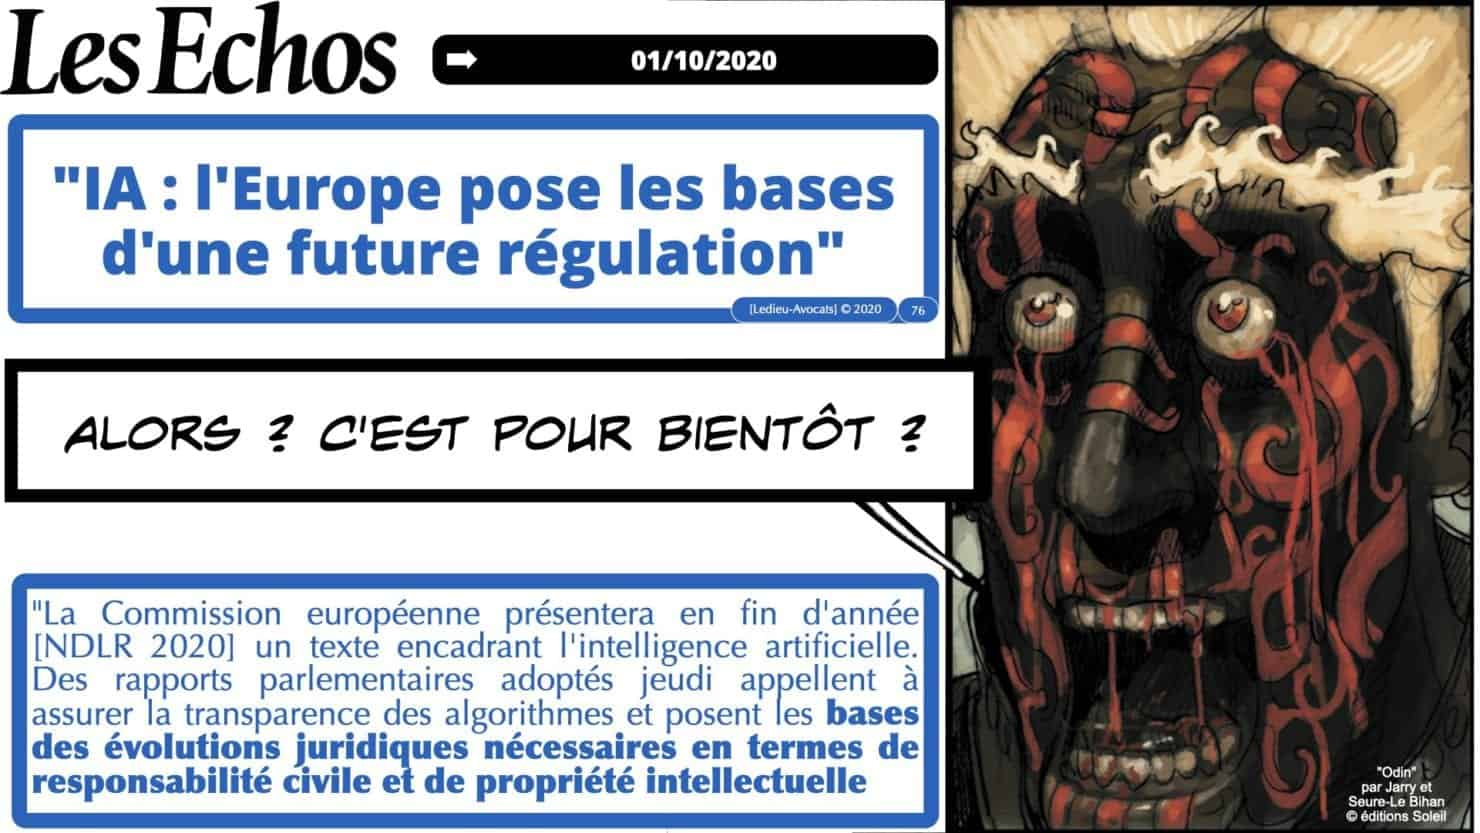 307 Intelligence artificielle-machine-learning-deep-learning-base de données-BIG-DATA *16:9* Constellation ©Ledieu-Avocat-13-10-2020.076